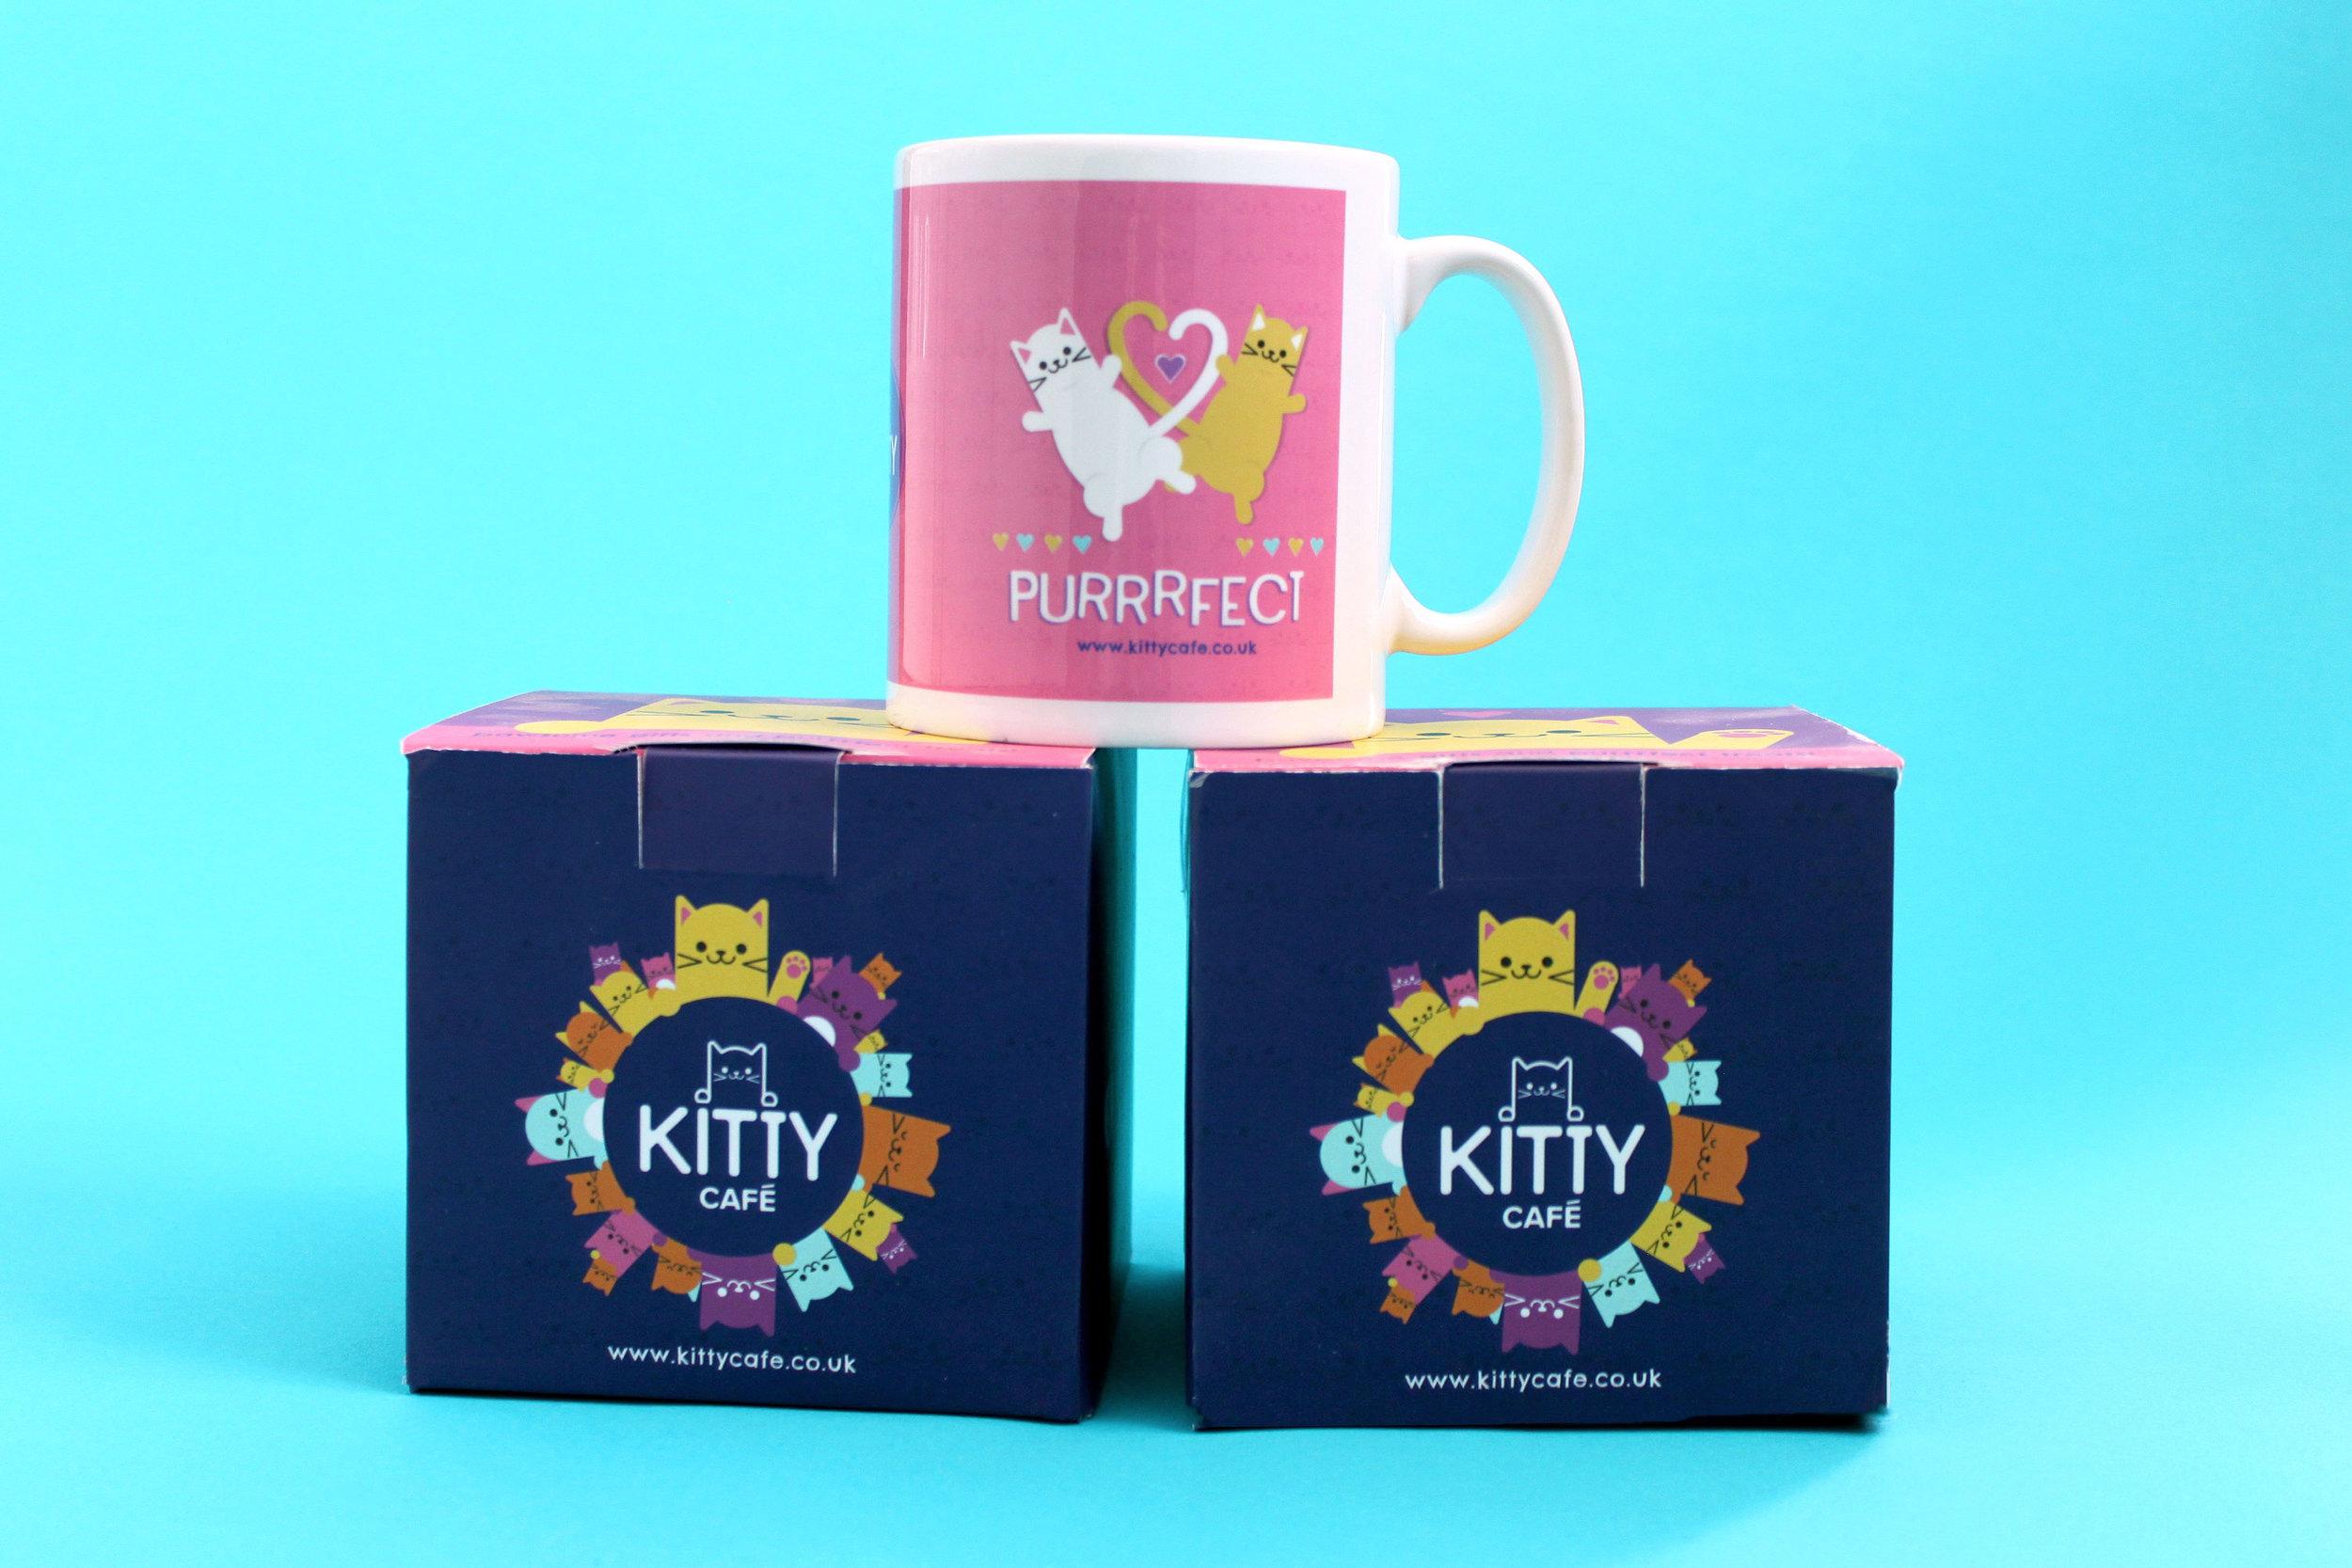 jess-bright-design-kitty-cafe-mugs1.jpg